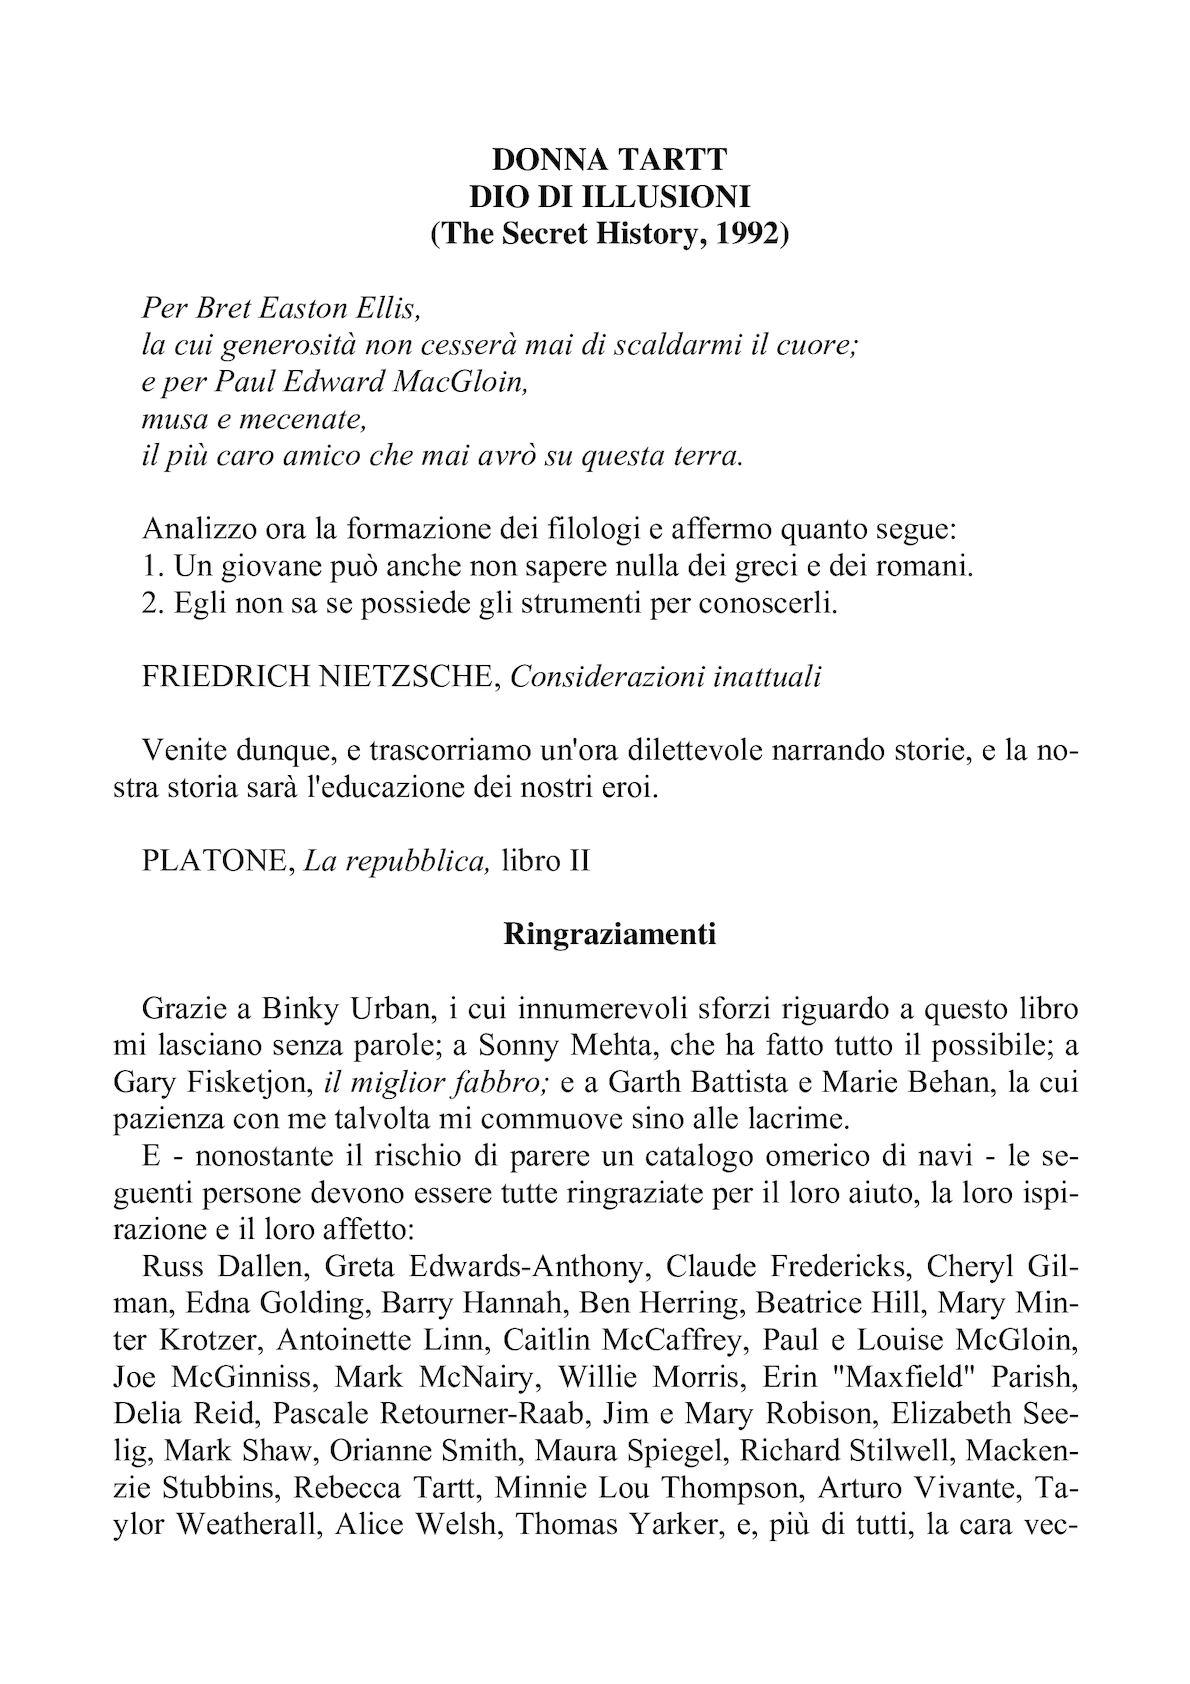 9ca55530740a Calaméo - Tartt Donna Dio Di Illusioni